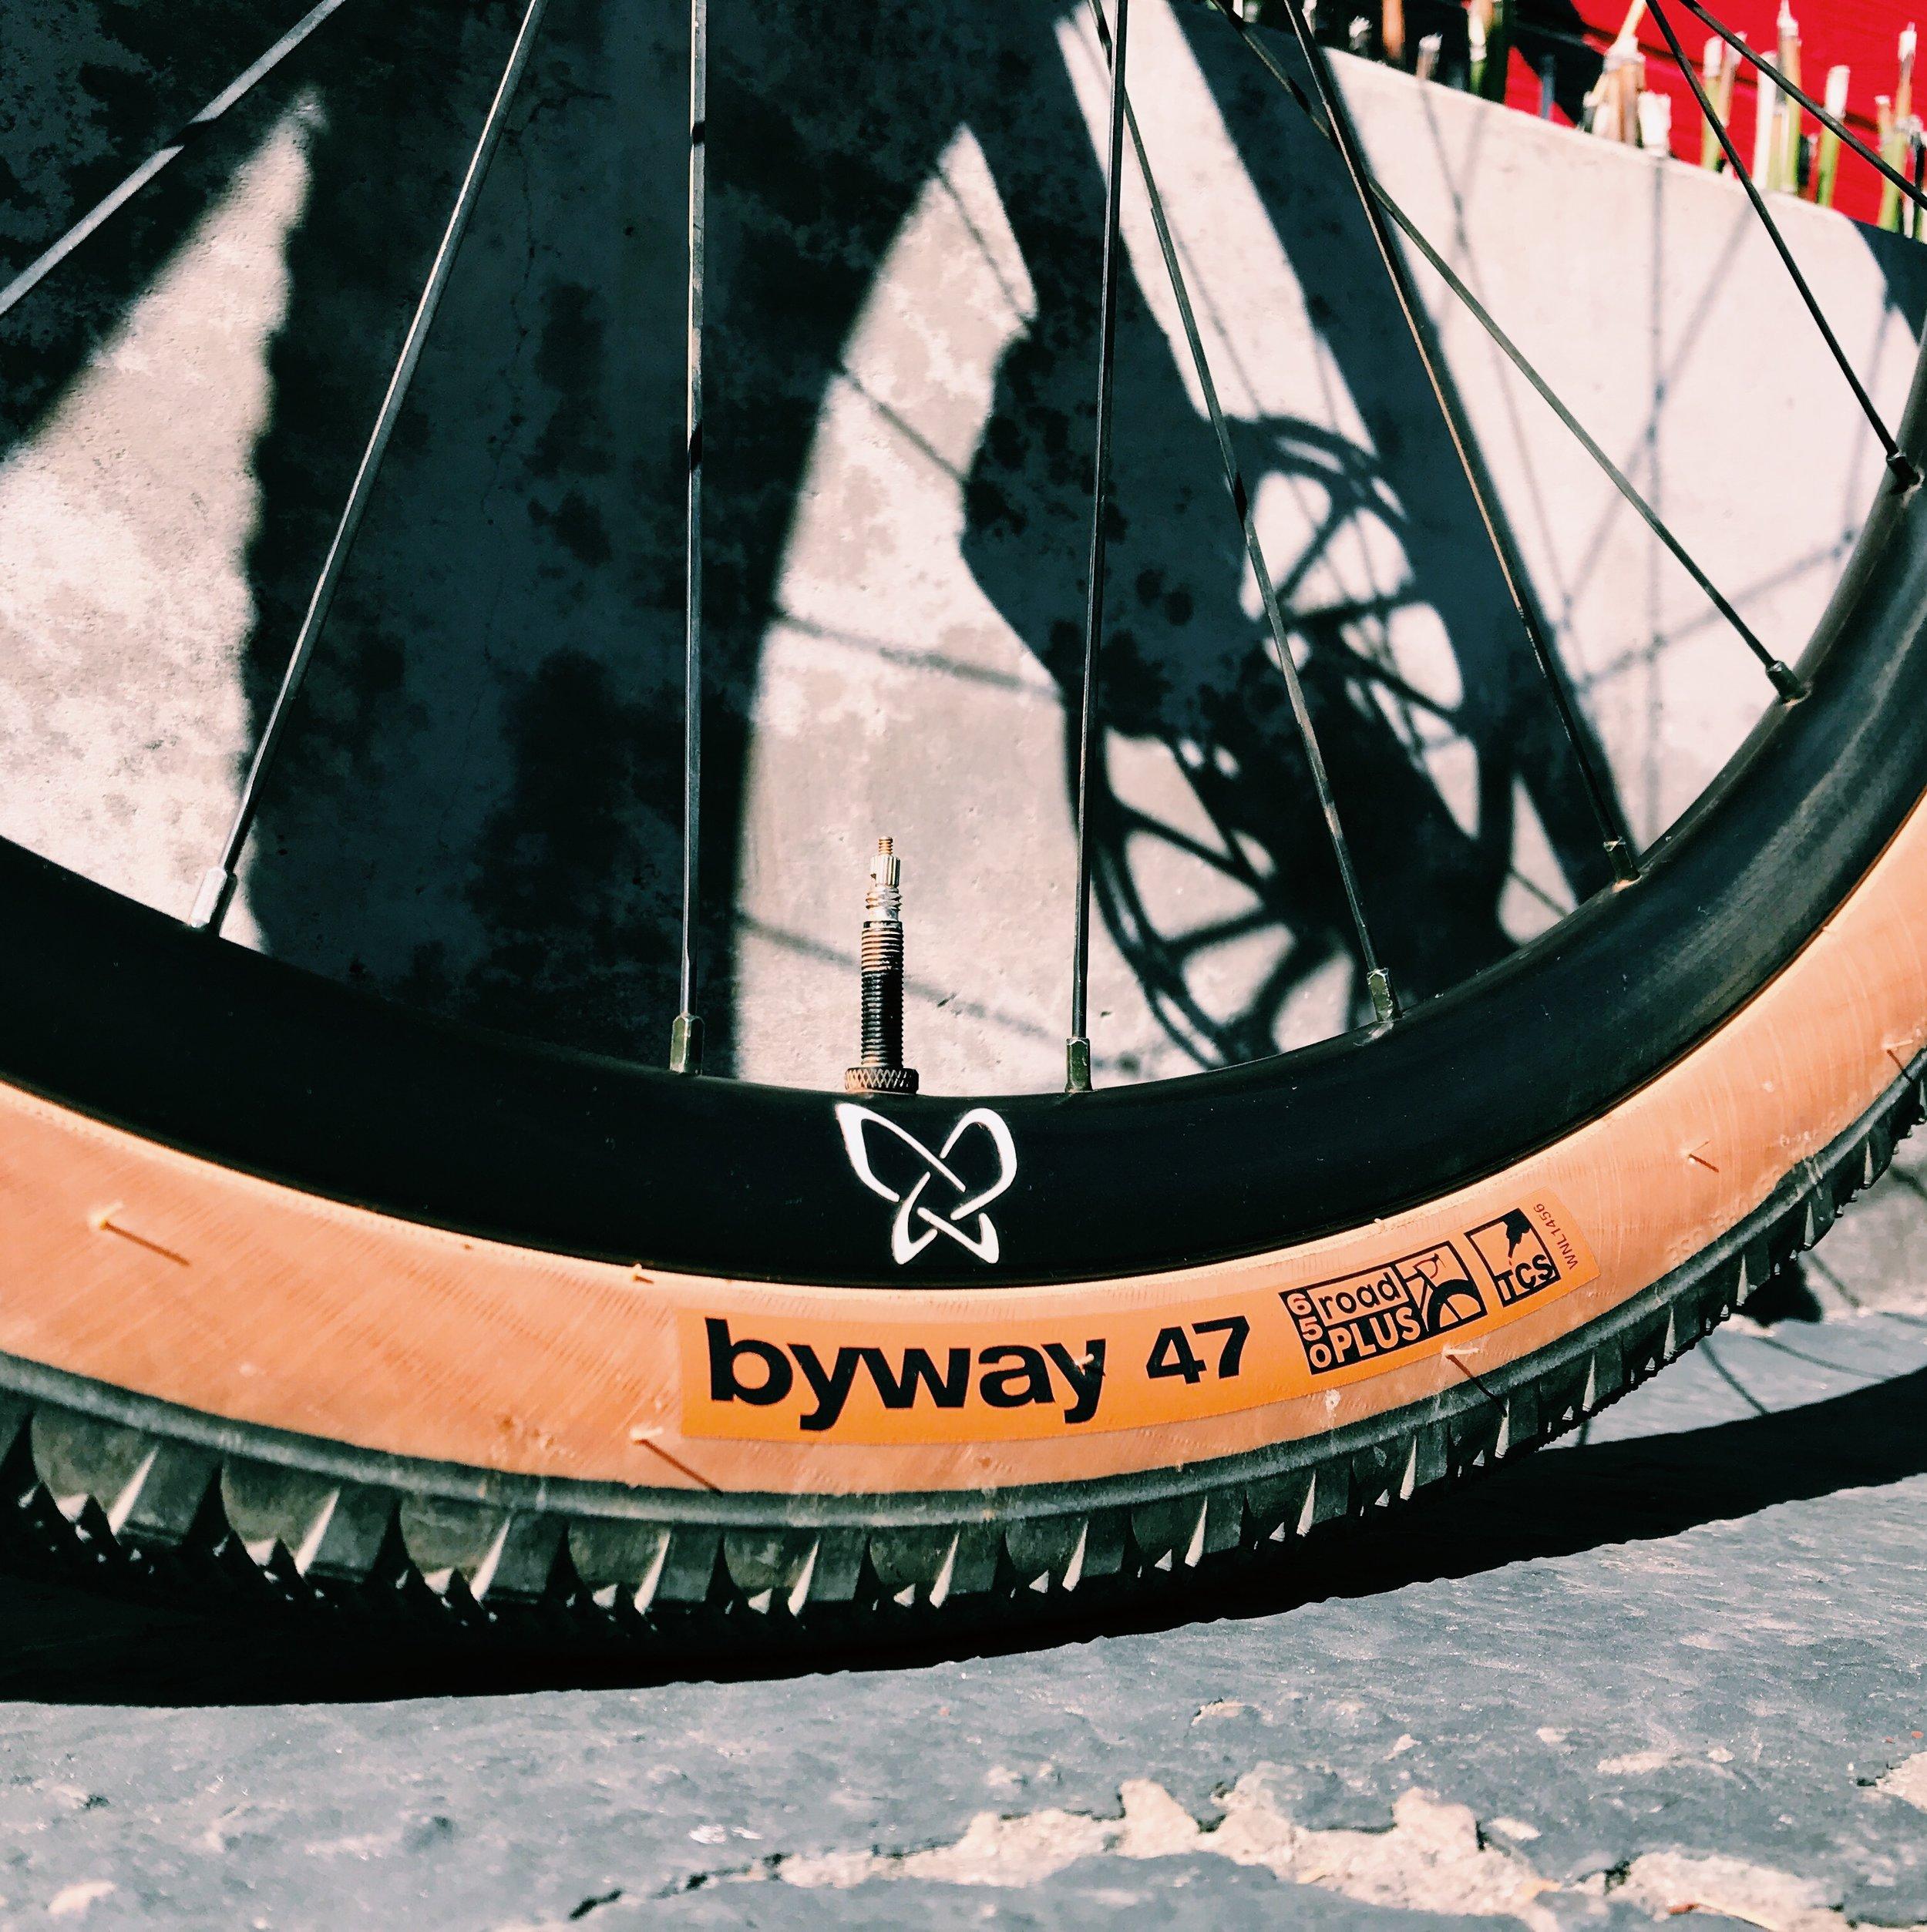 WTB Byway Gravel Tire